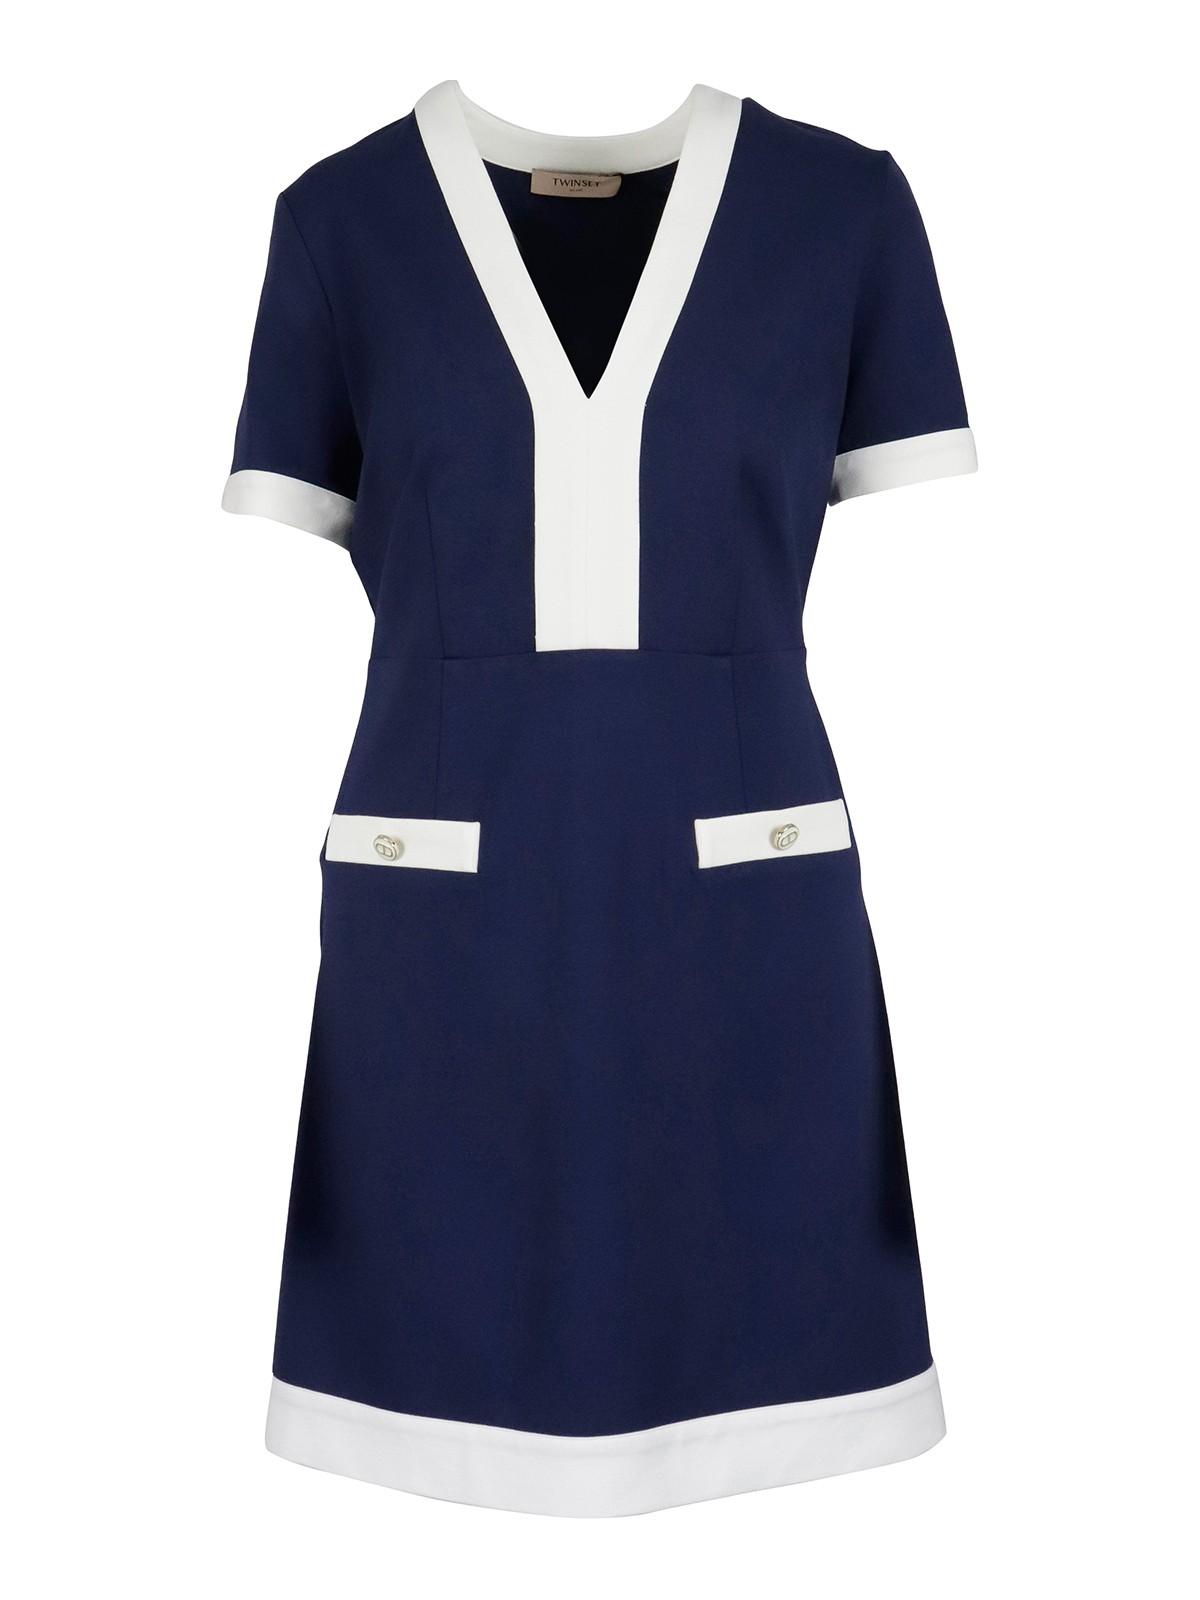 Twinset Dresses VISCOSE BLEND DRESS